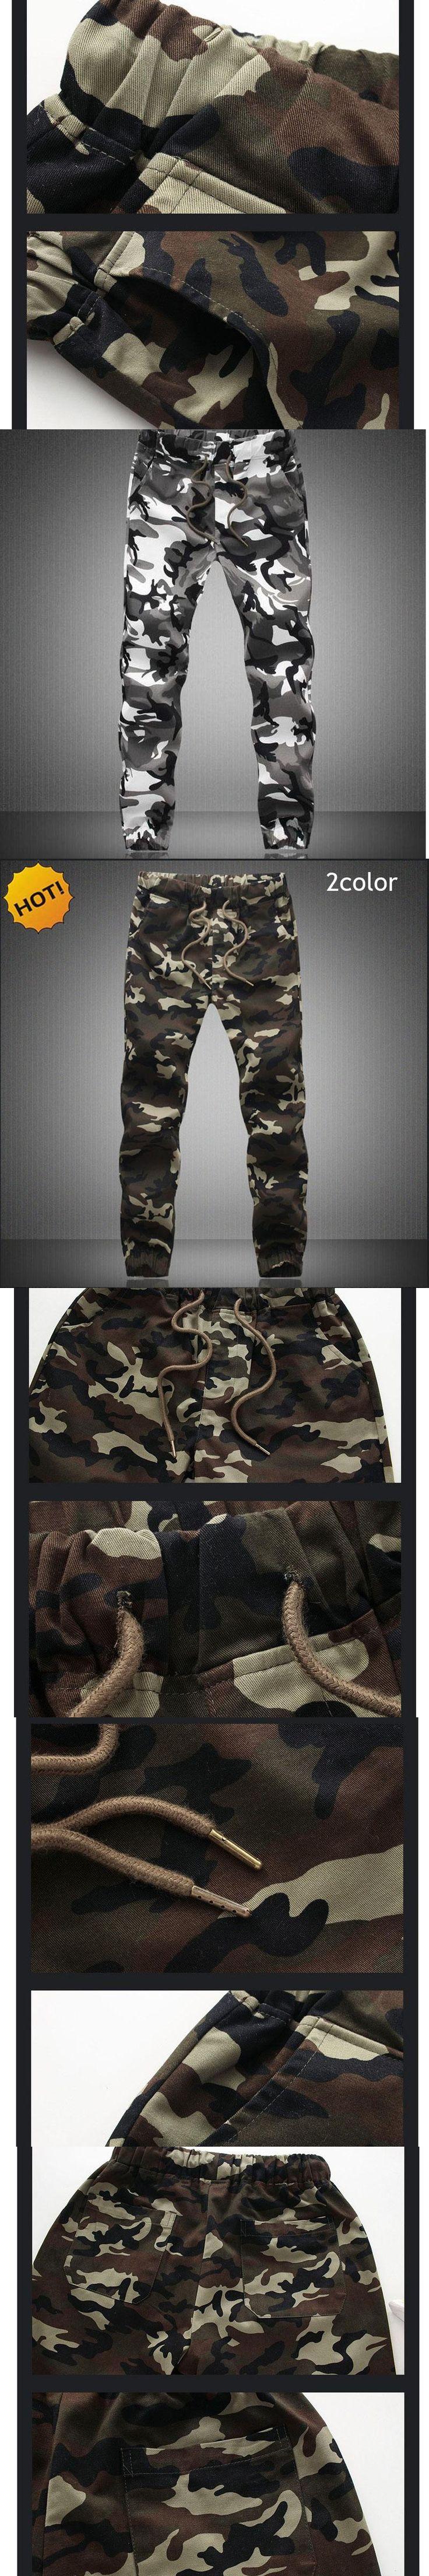 High Quality 2017 Outdoors Casual Camouflage Cotton Elastic Waist Drastring Cargo Harem Pants Men Camo Beam Plus Size 5XL